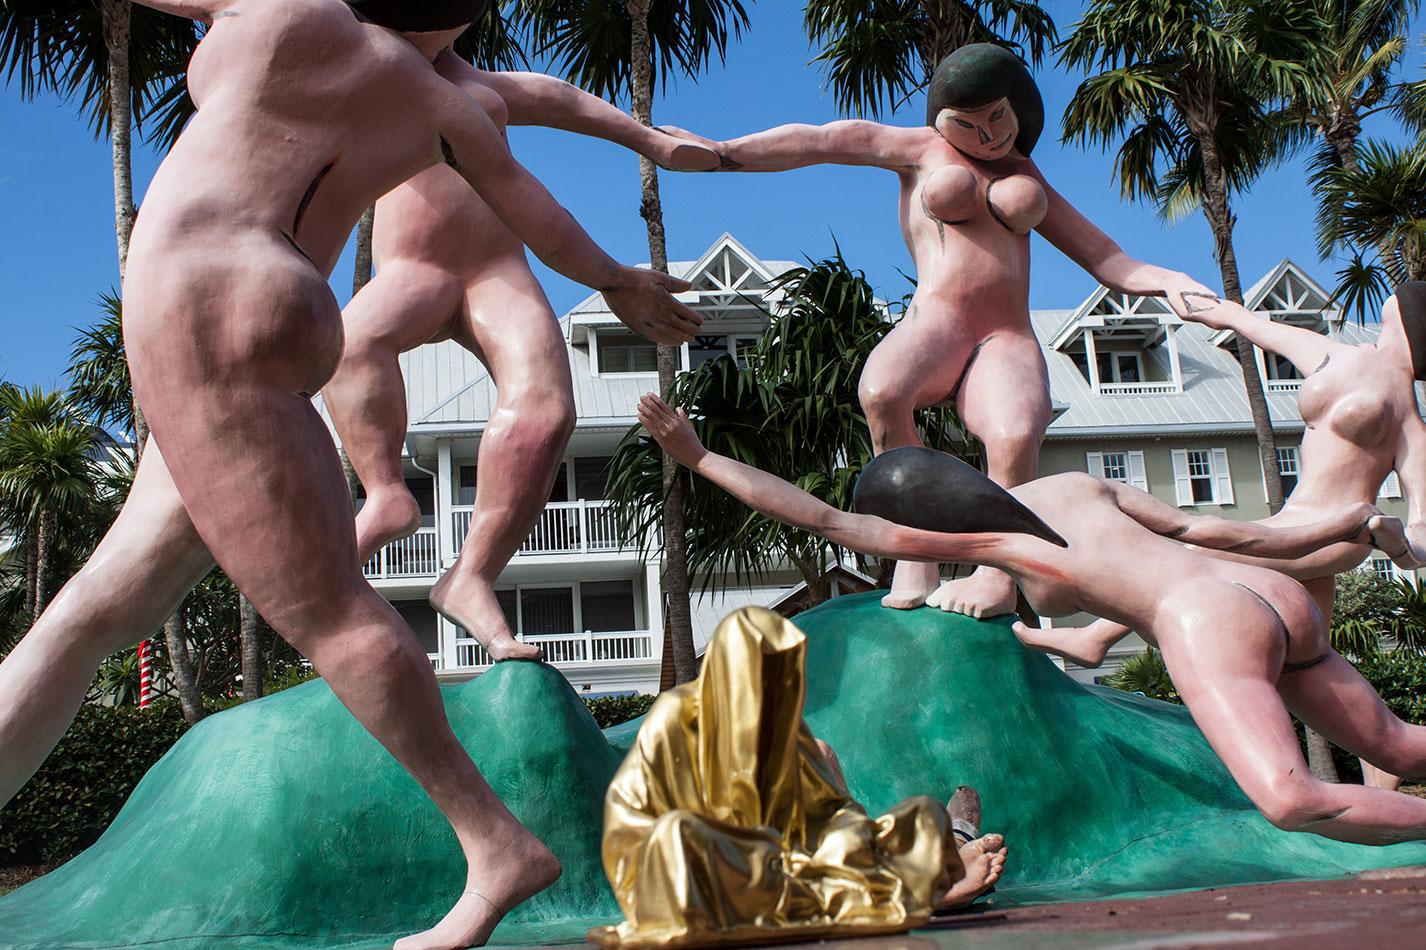 public-art-basel-miami-beach-fair-usa-florida-guardians-of-time-manfred-kili-kielnhofer-contemporary-fine-art-modern-arts-design-antiques-sculpture-6748